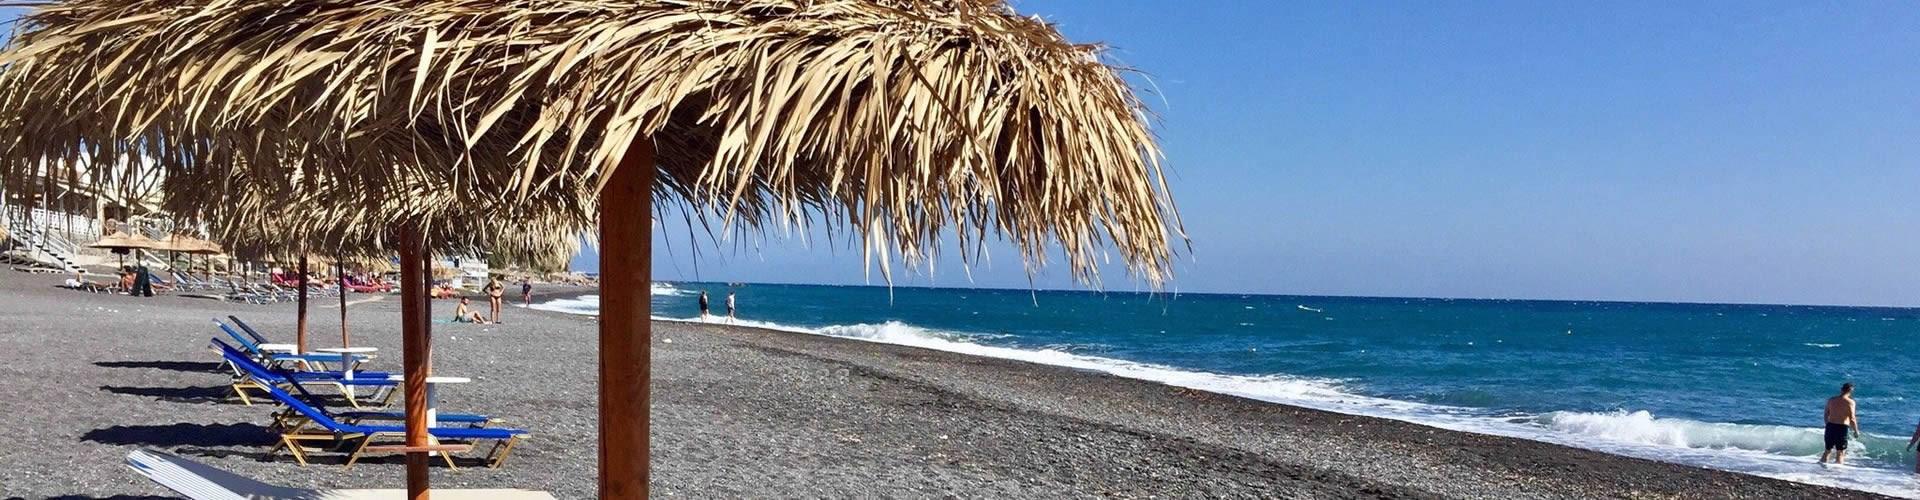 Kamari beach - Beaches - Santorini